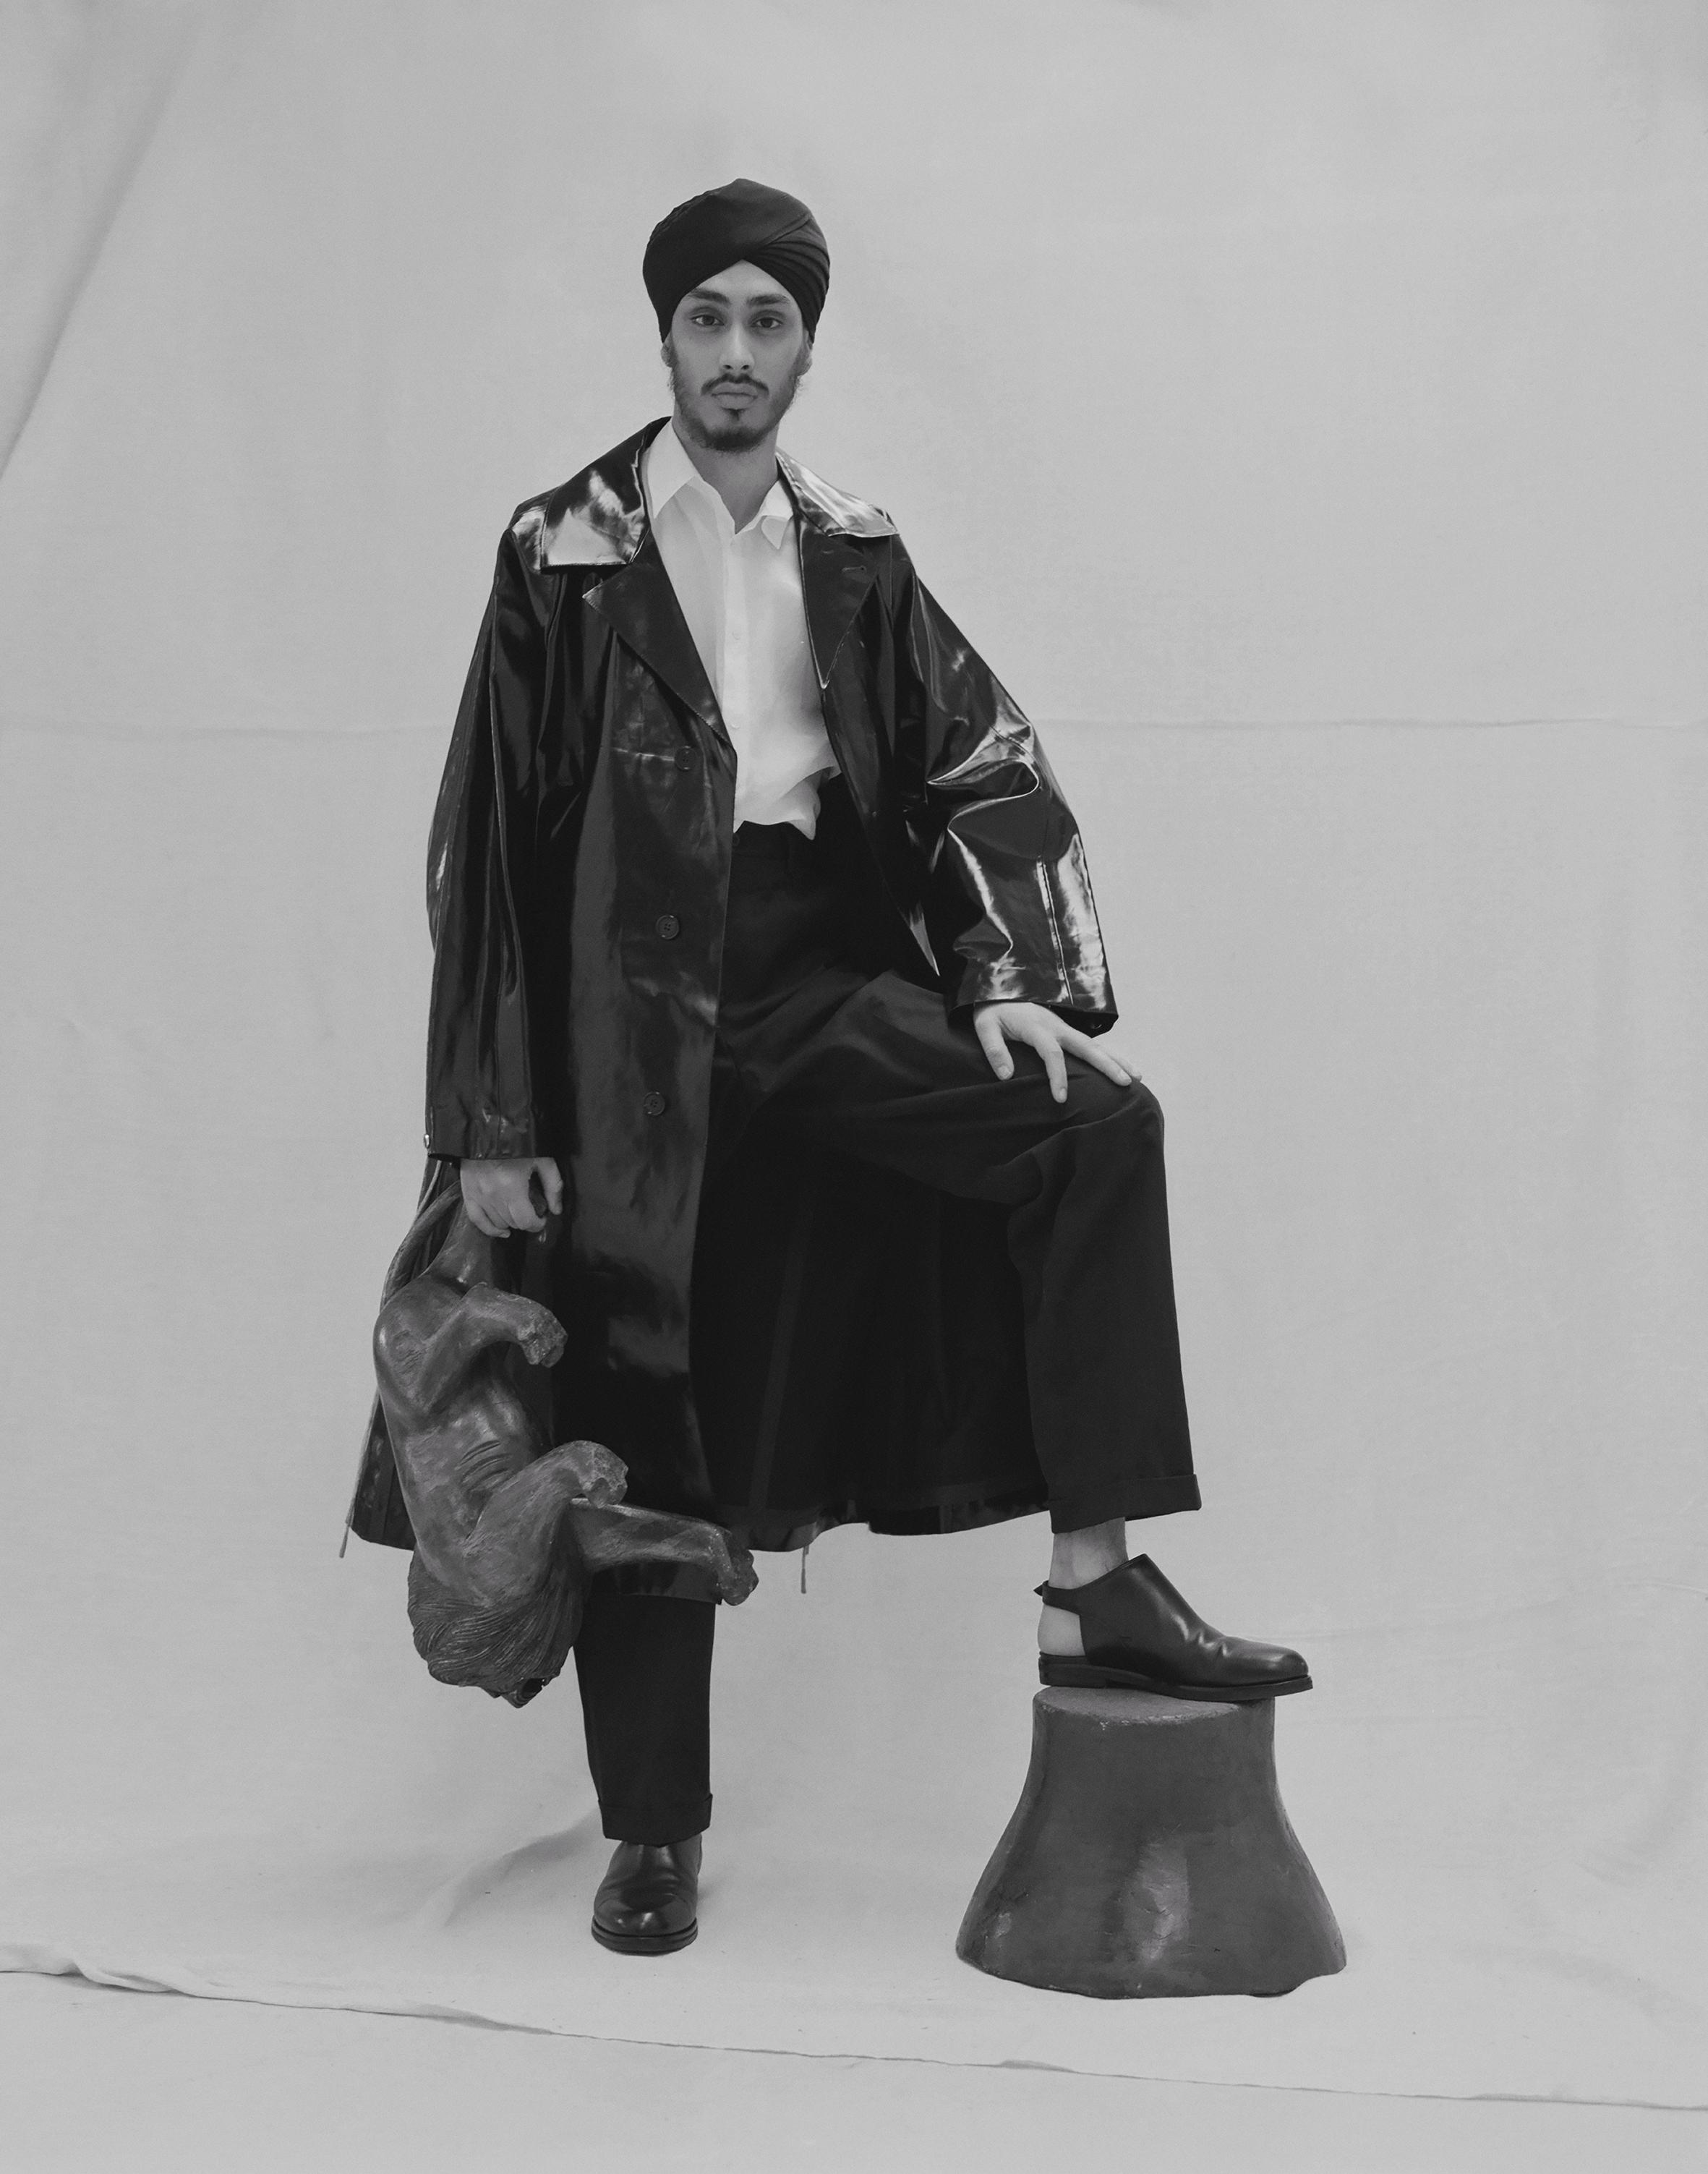 Patent leather coat ACNE STUDIOS,white poplin shirt E. TAUTZ,suit trousers MARGARET HOWELL,calfskin cut off sandals MAISON MARGIELA.